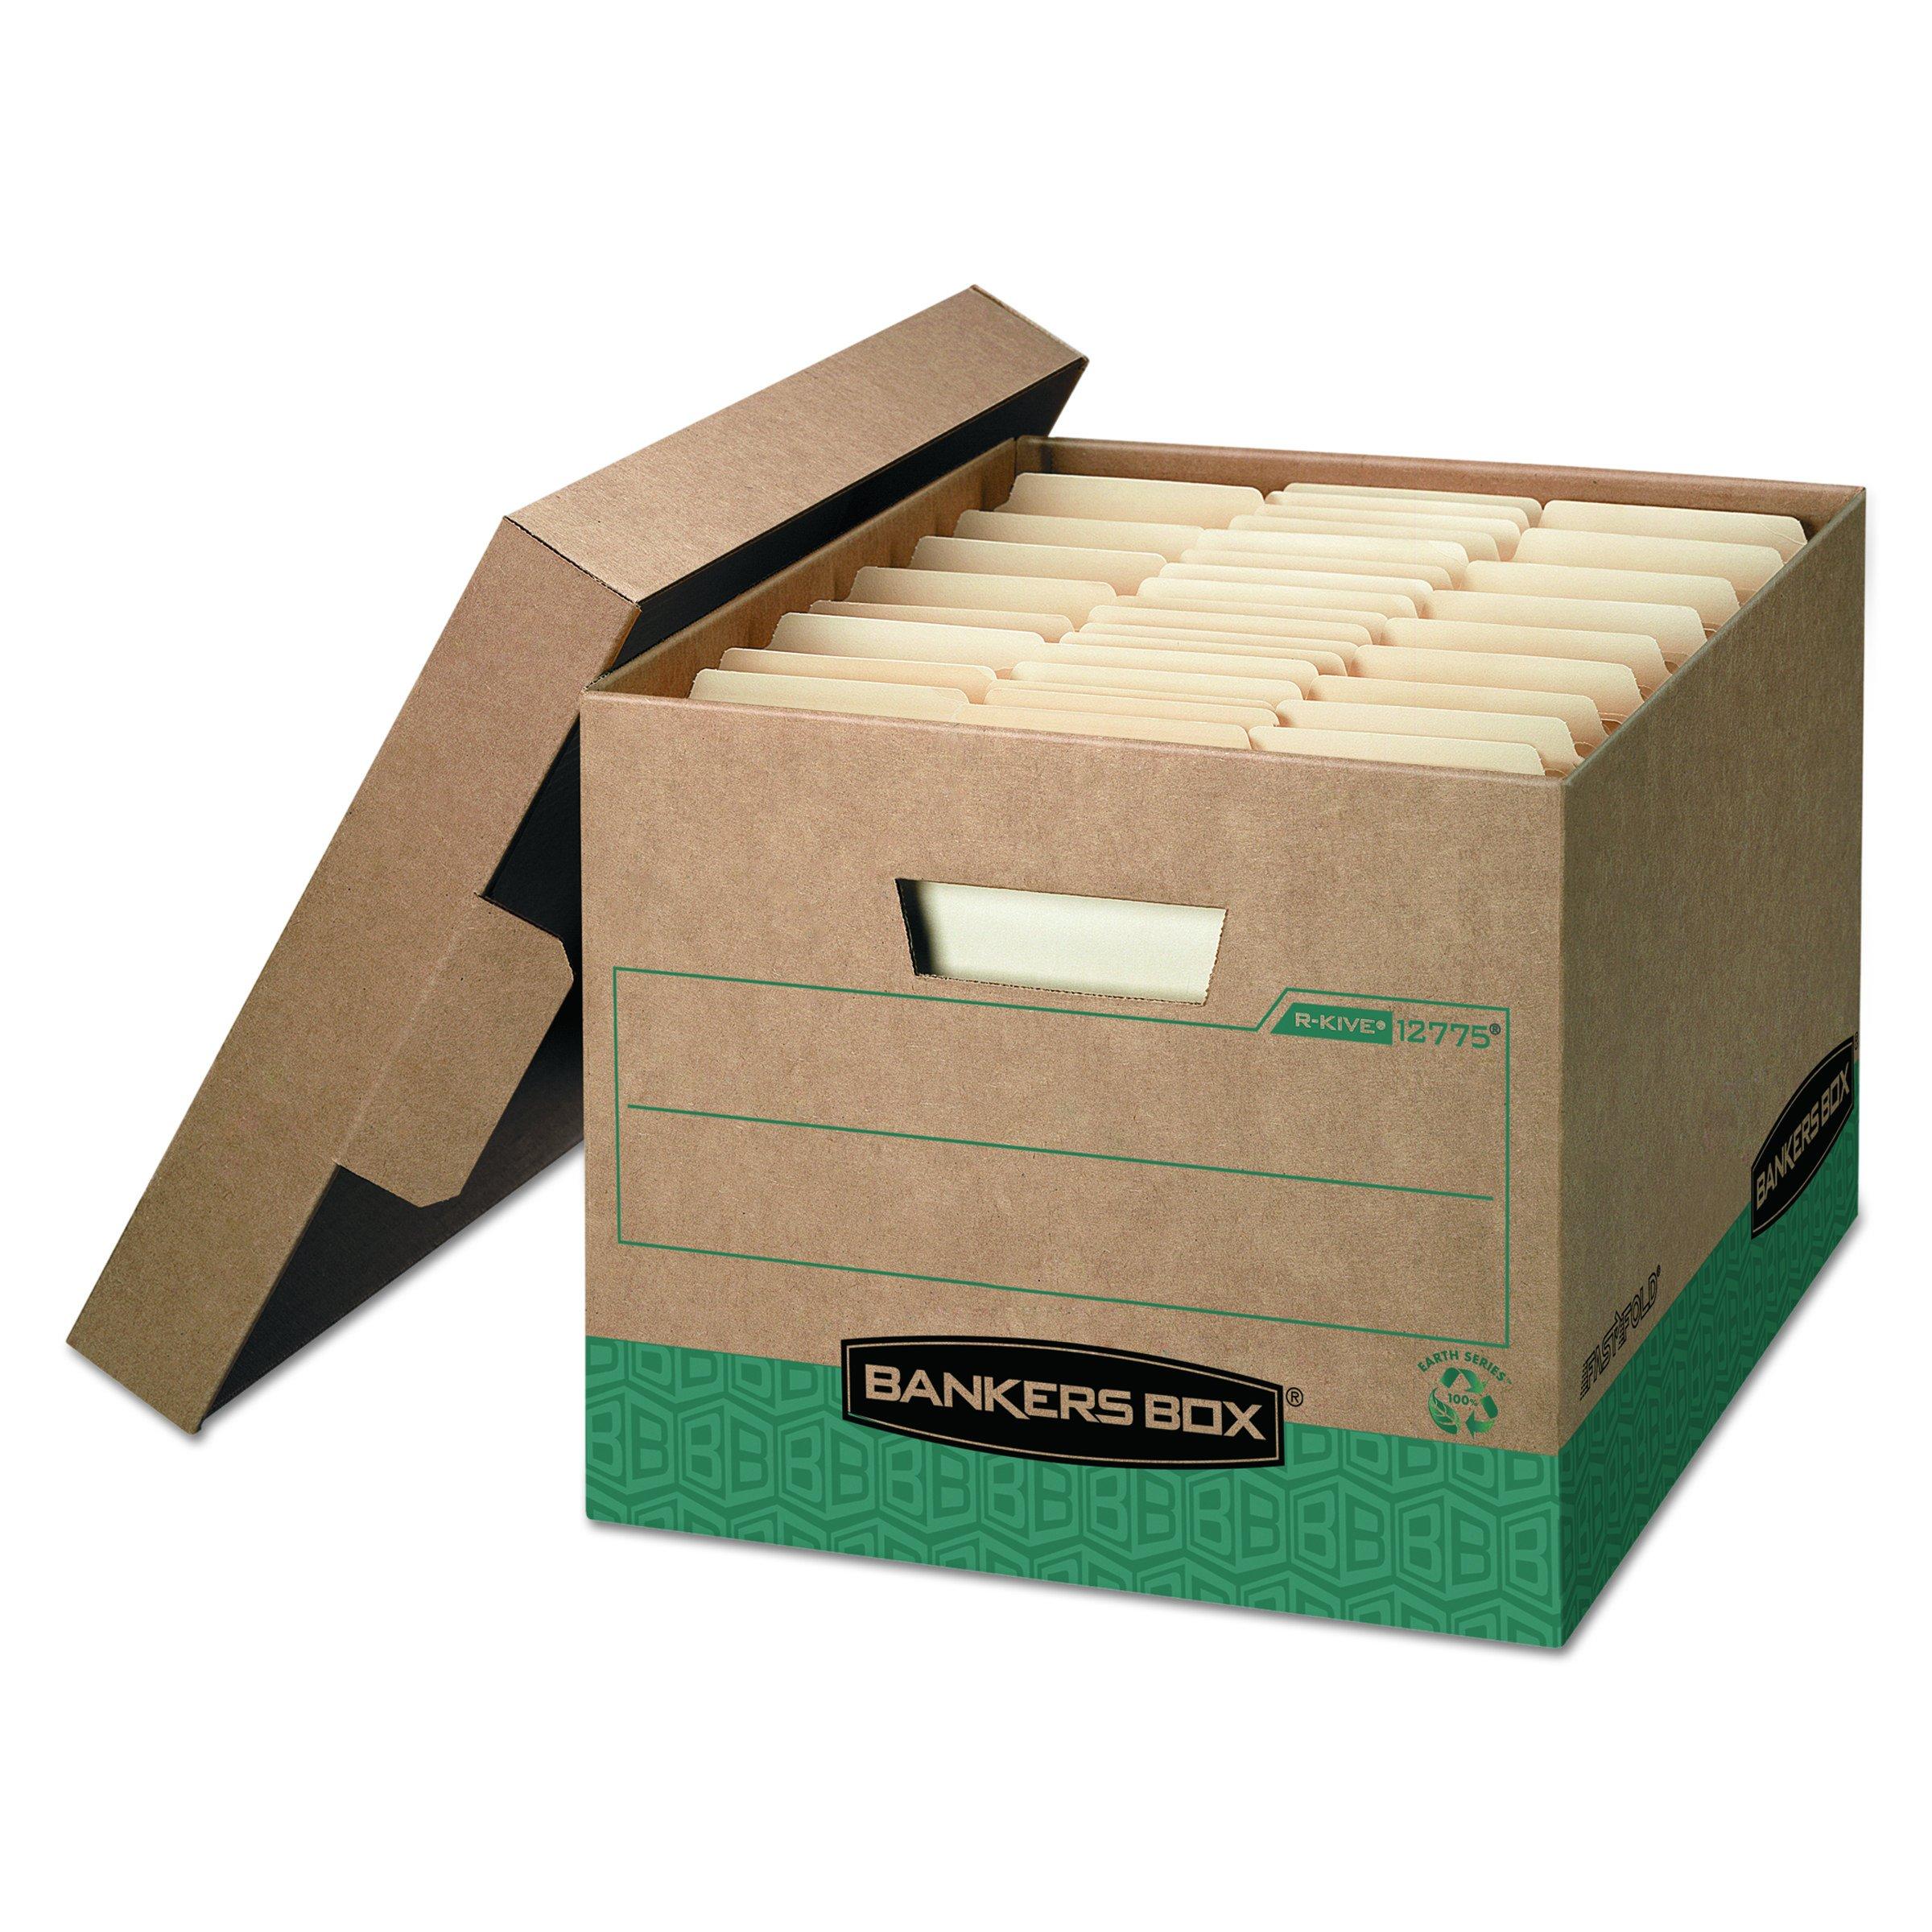 Bankers Box 12775 R-KIVE Storage Box, Letter/Legal, Locking Lift-off Lid, Kraft/Green (Case of 12)